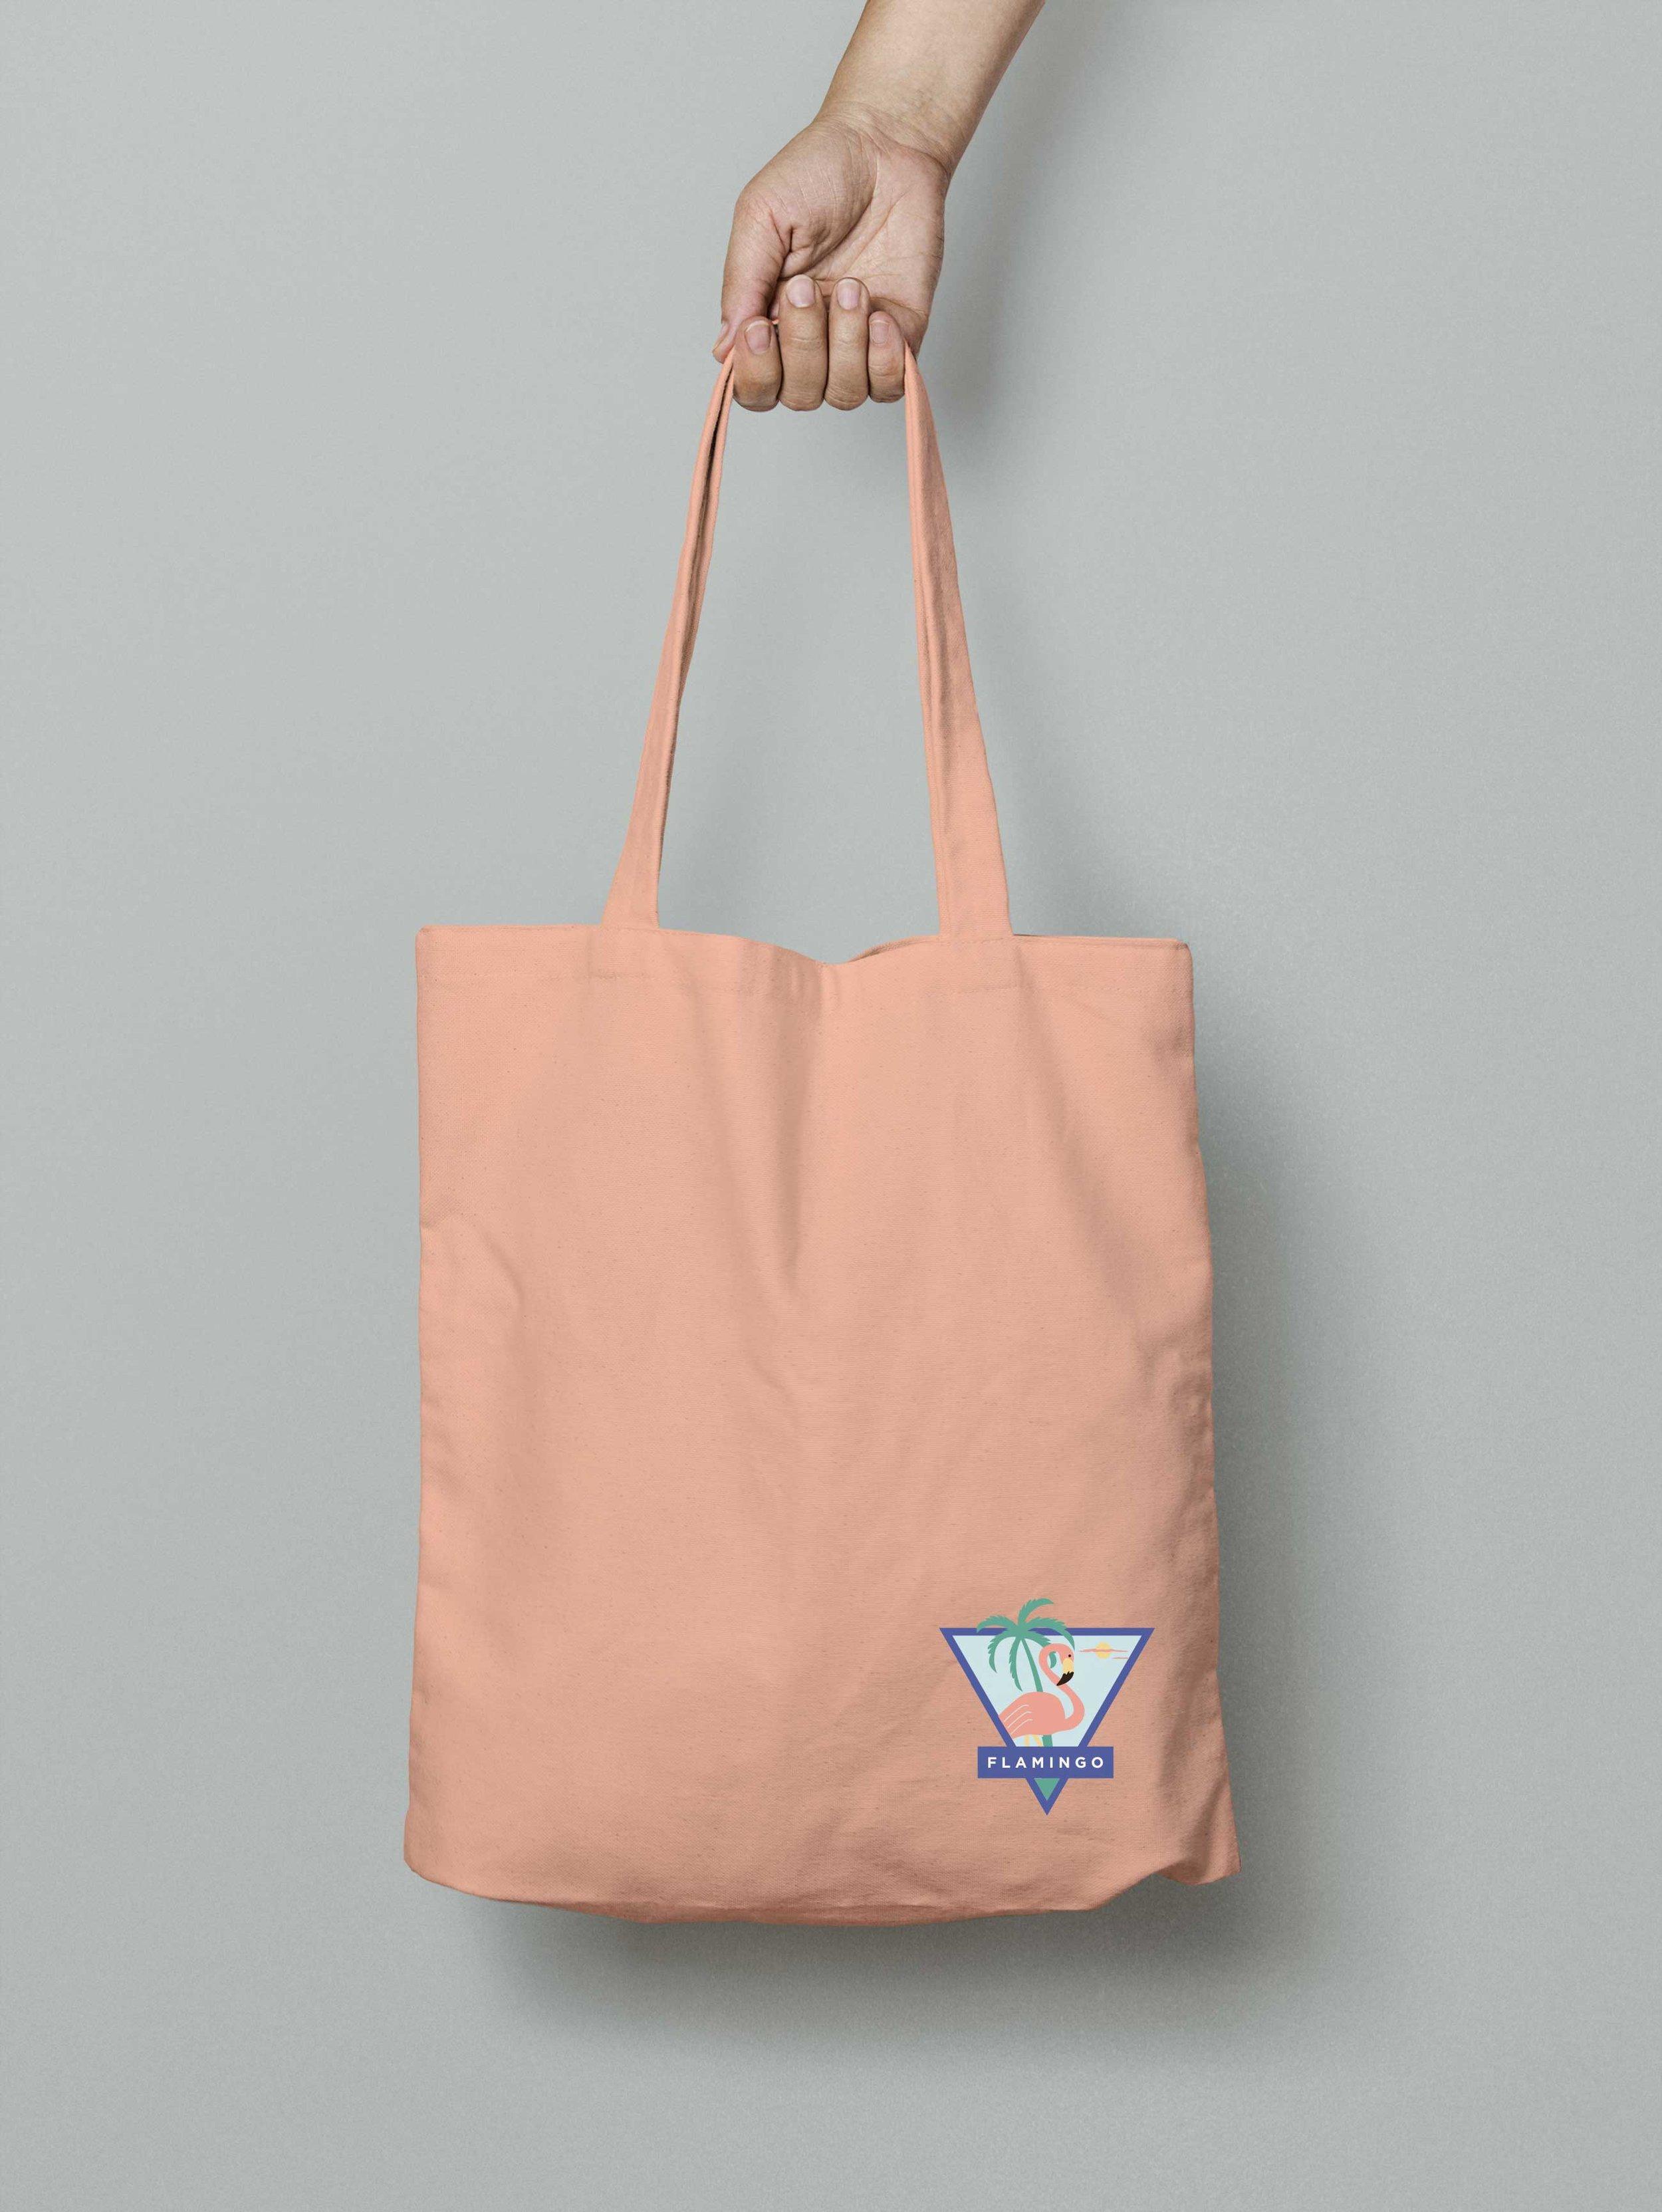 Tote-Bag-flamingo-ilustracion1.jpg